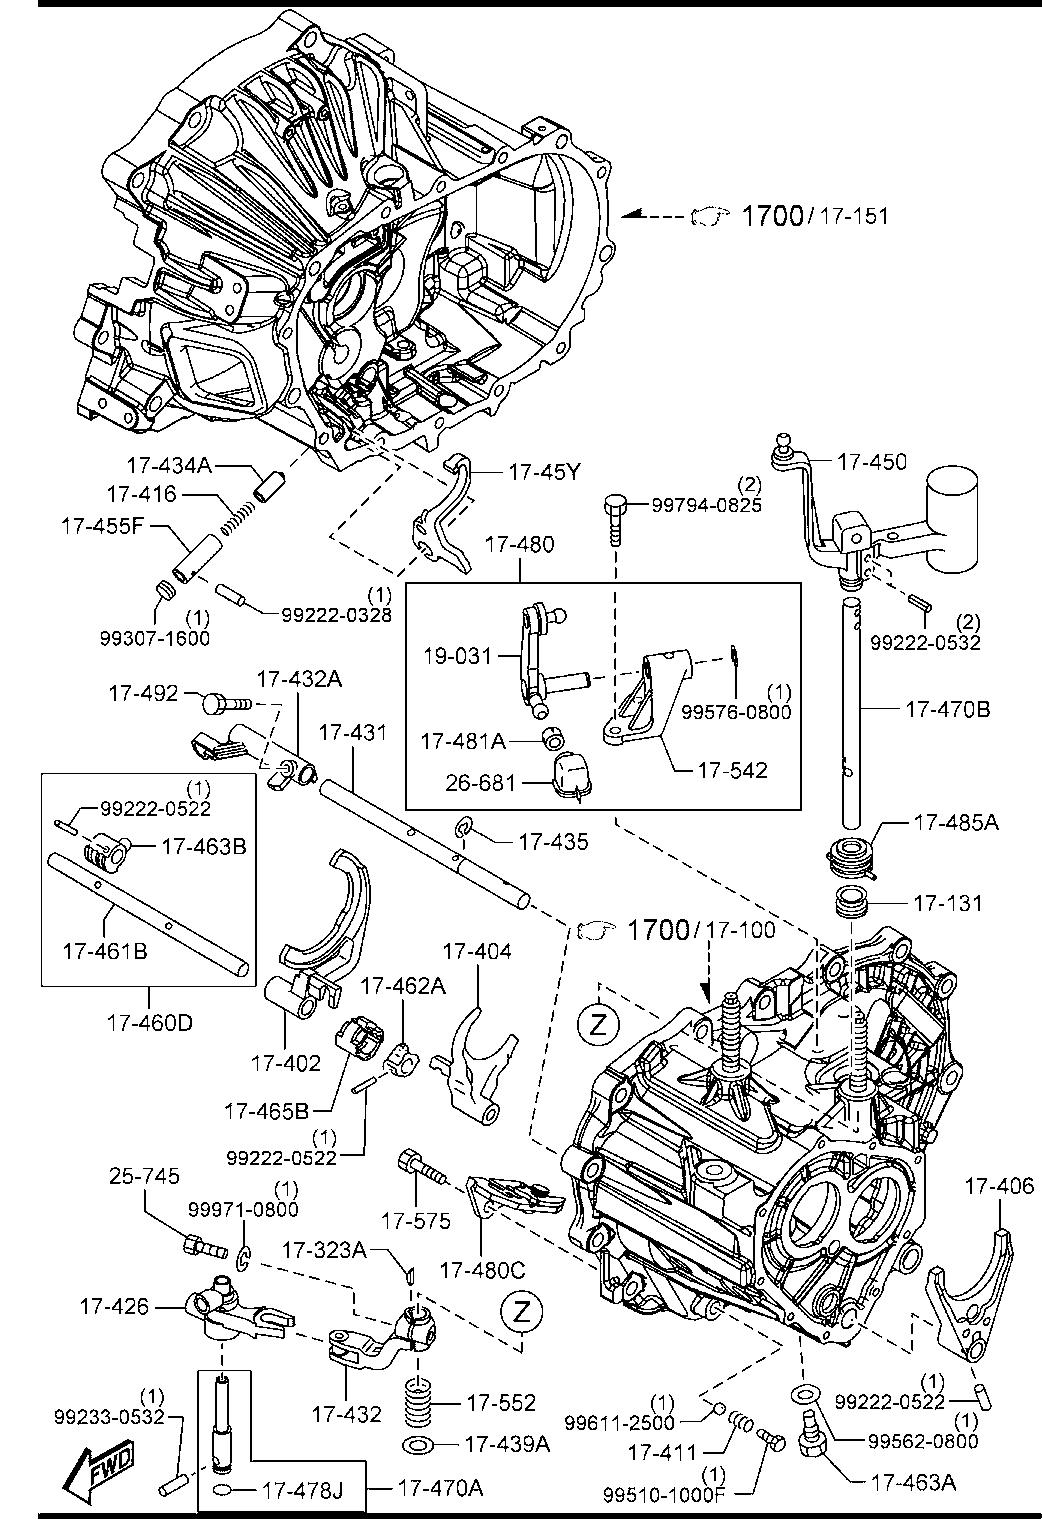 2012 Mazda 3 Engine Diagram Tail Light Wiring Diagram For Kenworth Tomosa35 Jeep Wrangler Waystar Fr